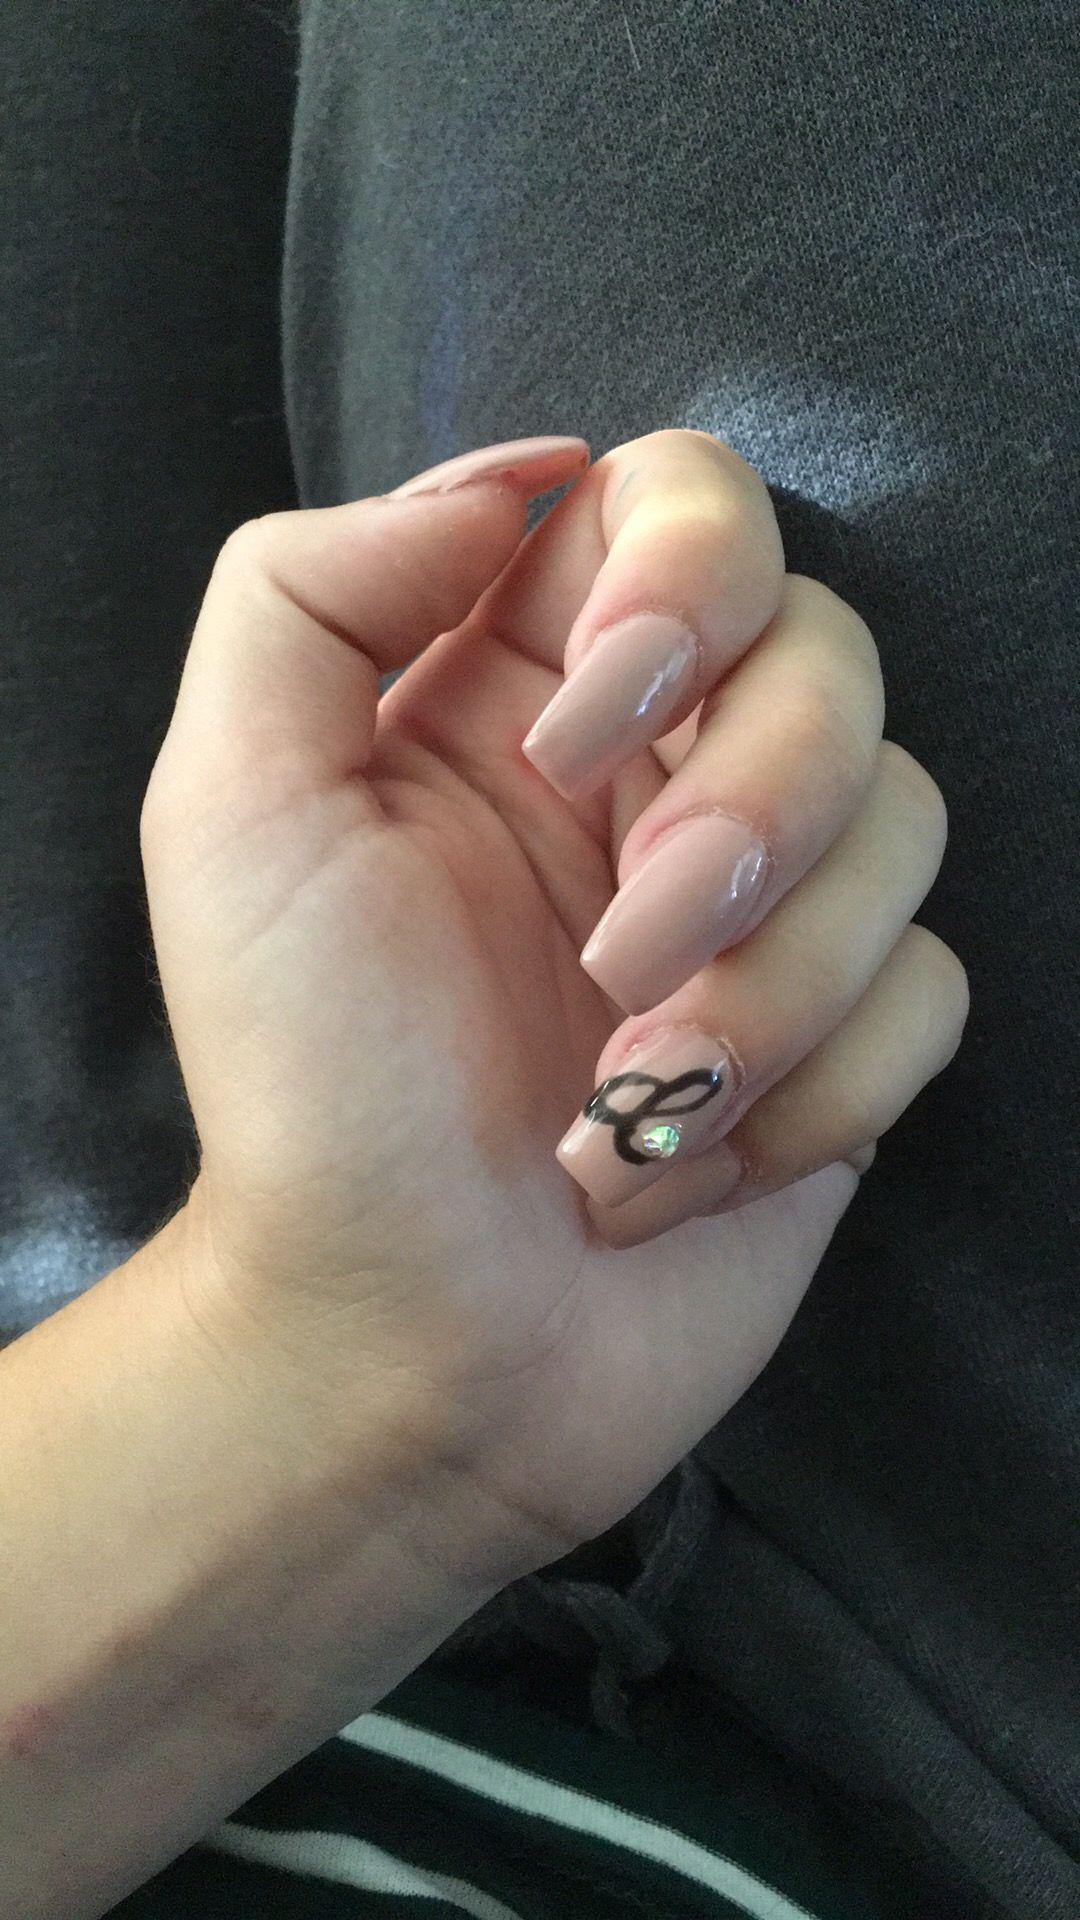 Initial Nails For My Bf Dream Nails Acrylic Nails Coffin Pink Shellac Nails Fall